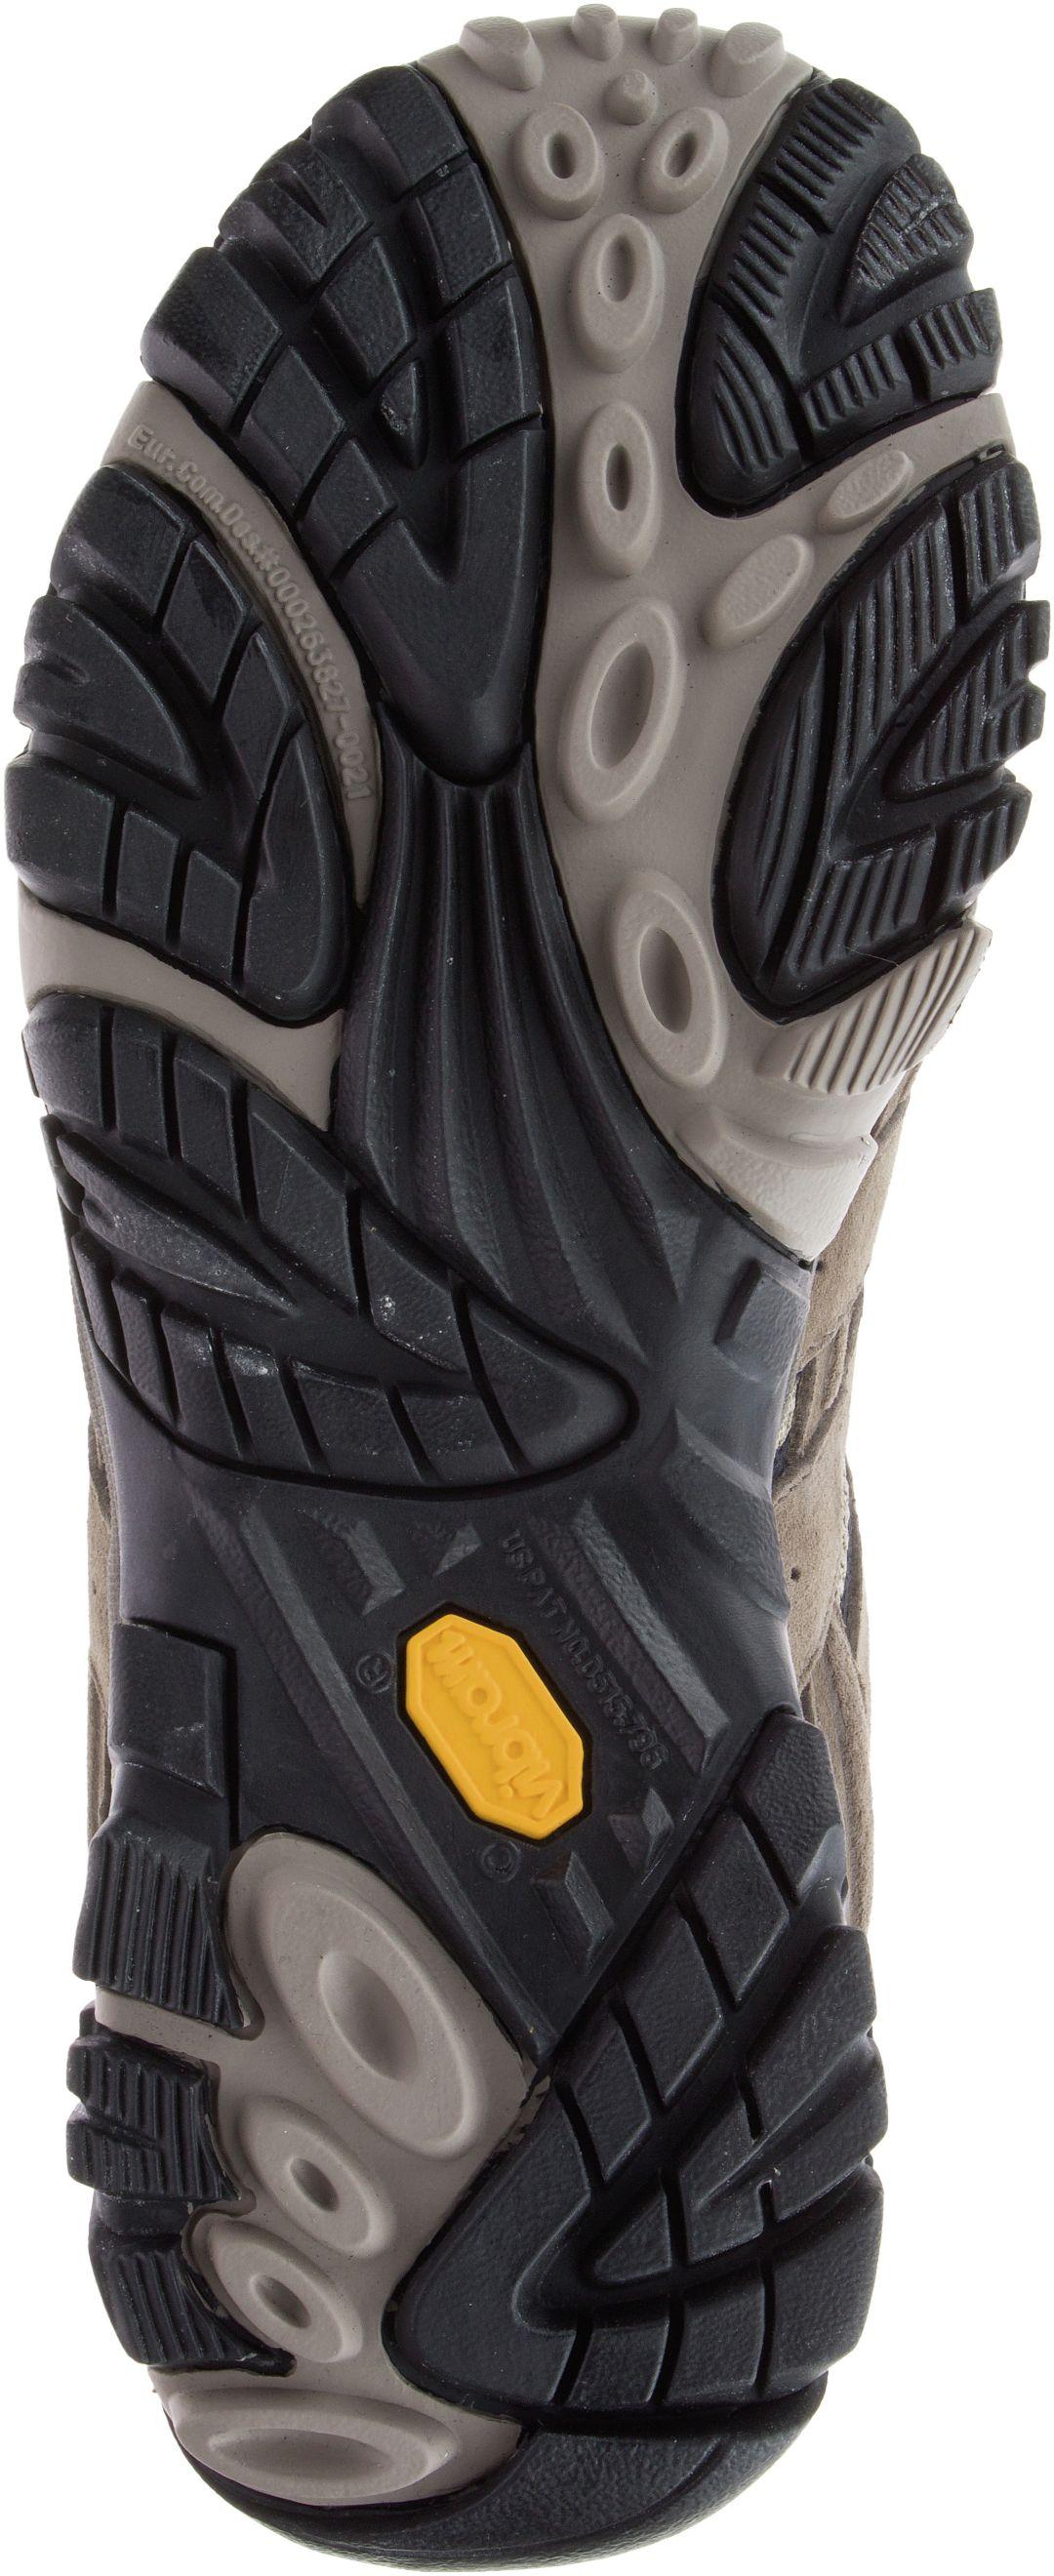 bb9d2f54d9b Merrell Men's Moab 2 Waterproof Hiking Shoes